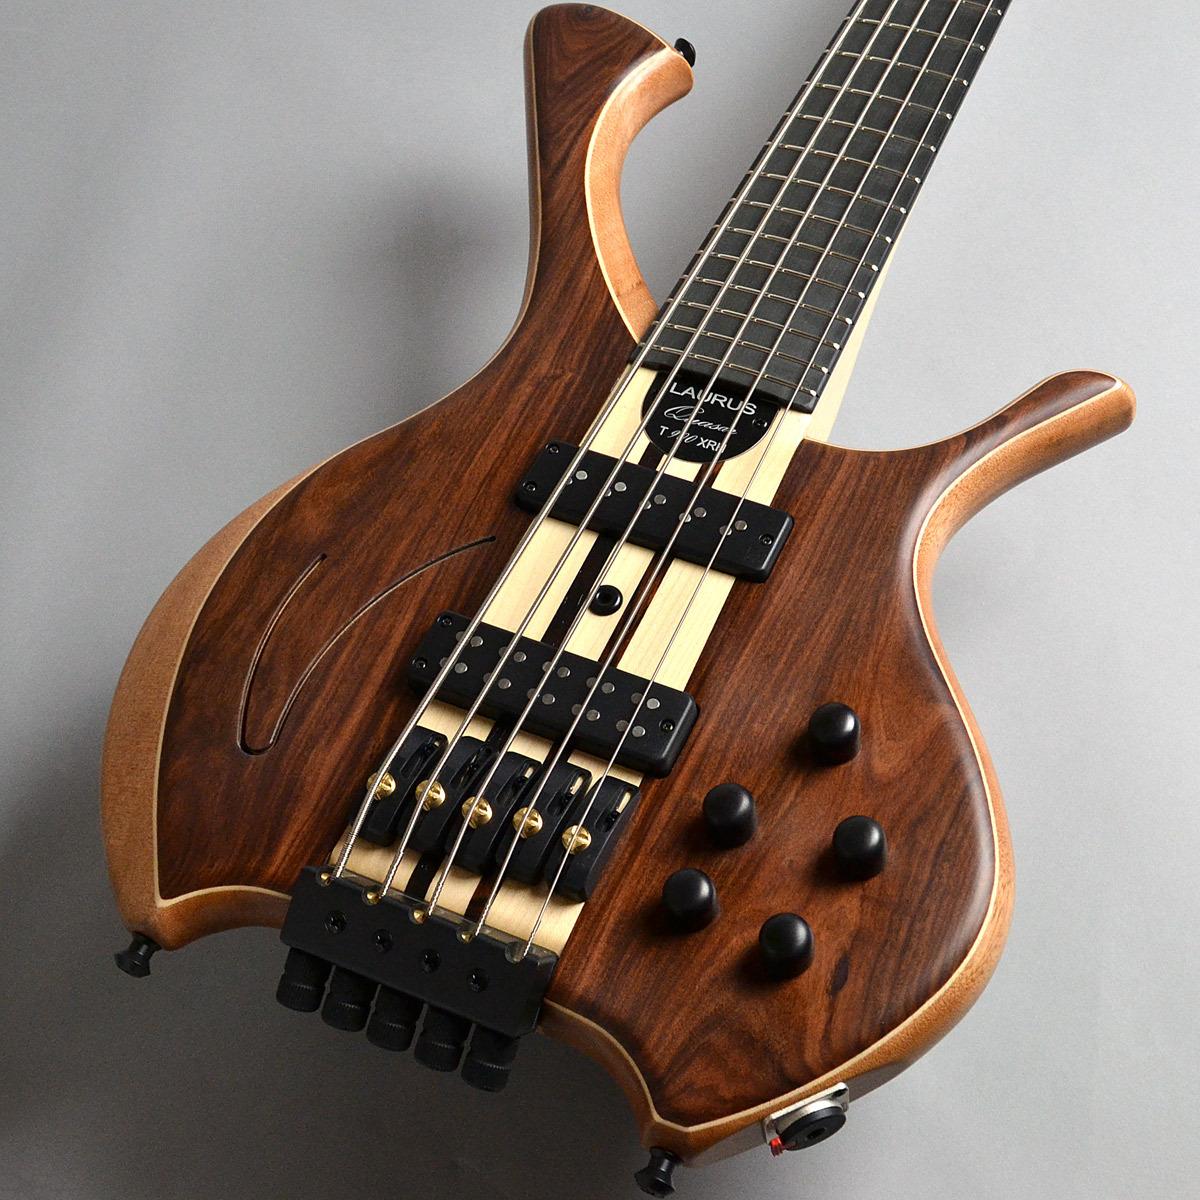 Laurus Quasar T900-XRH 5st Rosewood Top エレキベース(5弦) 【ロウラス】【新宿PePe店】